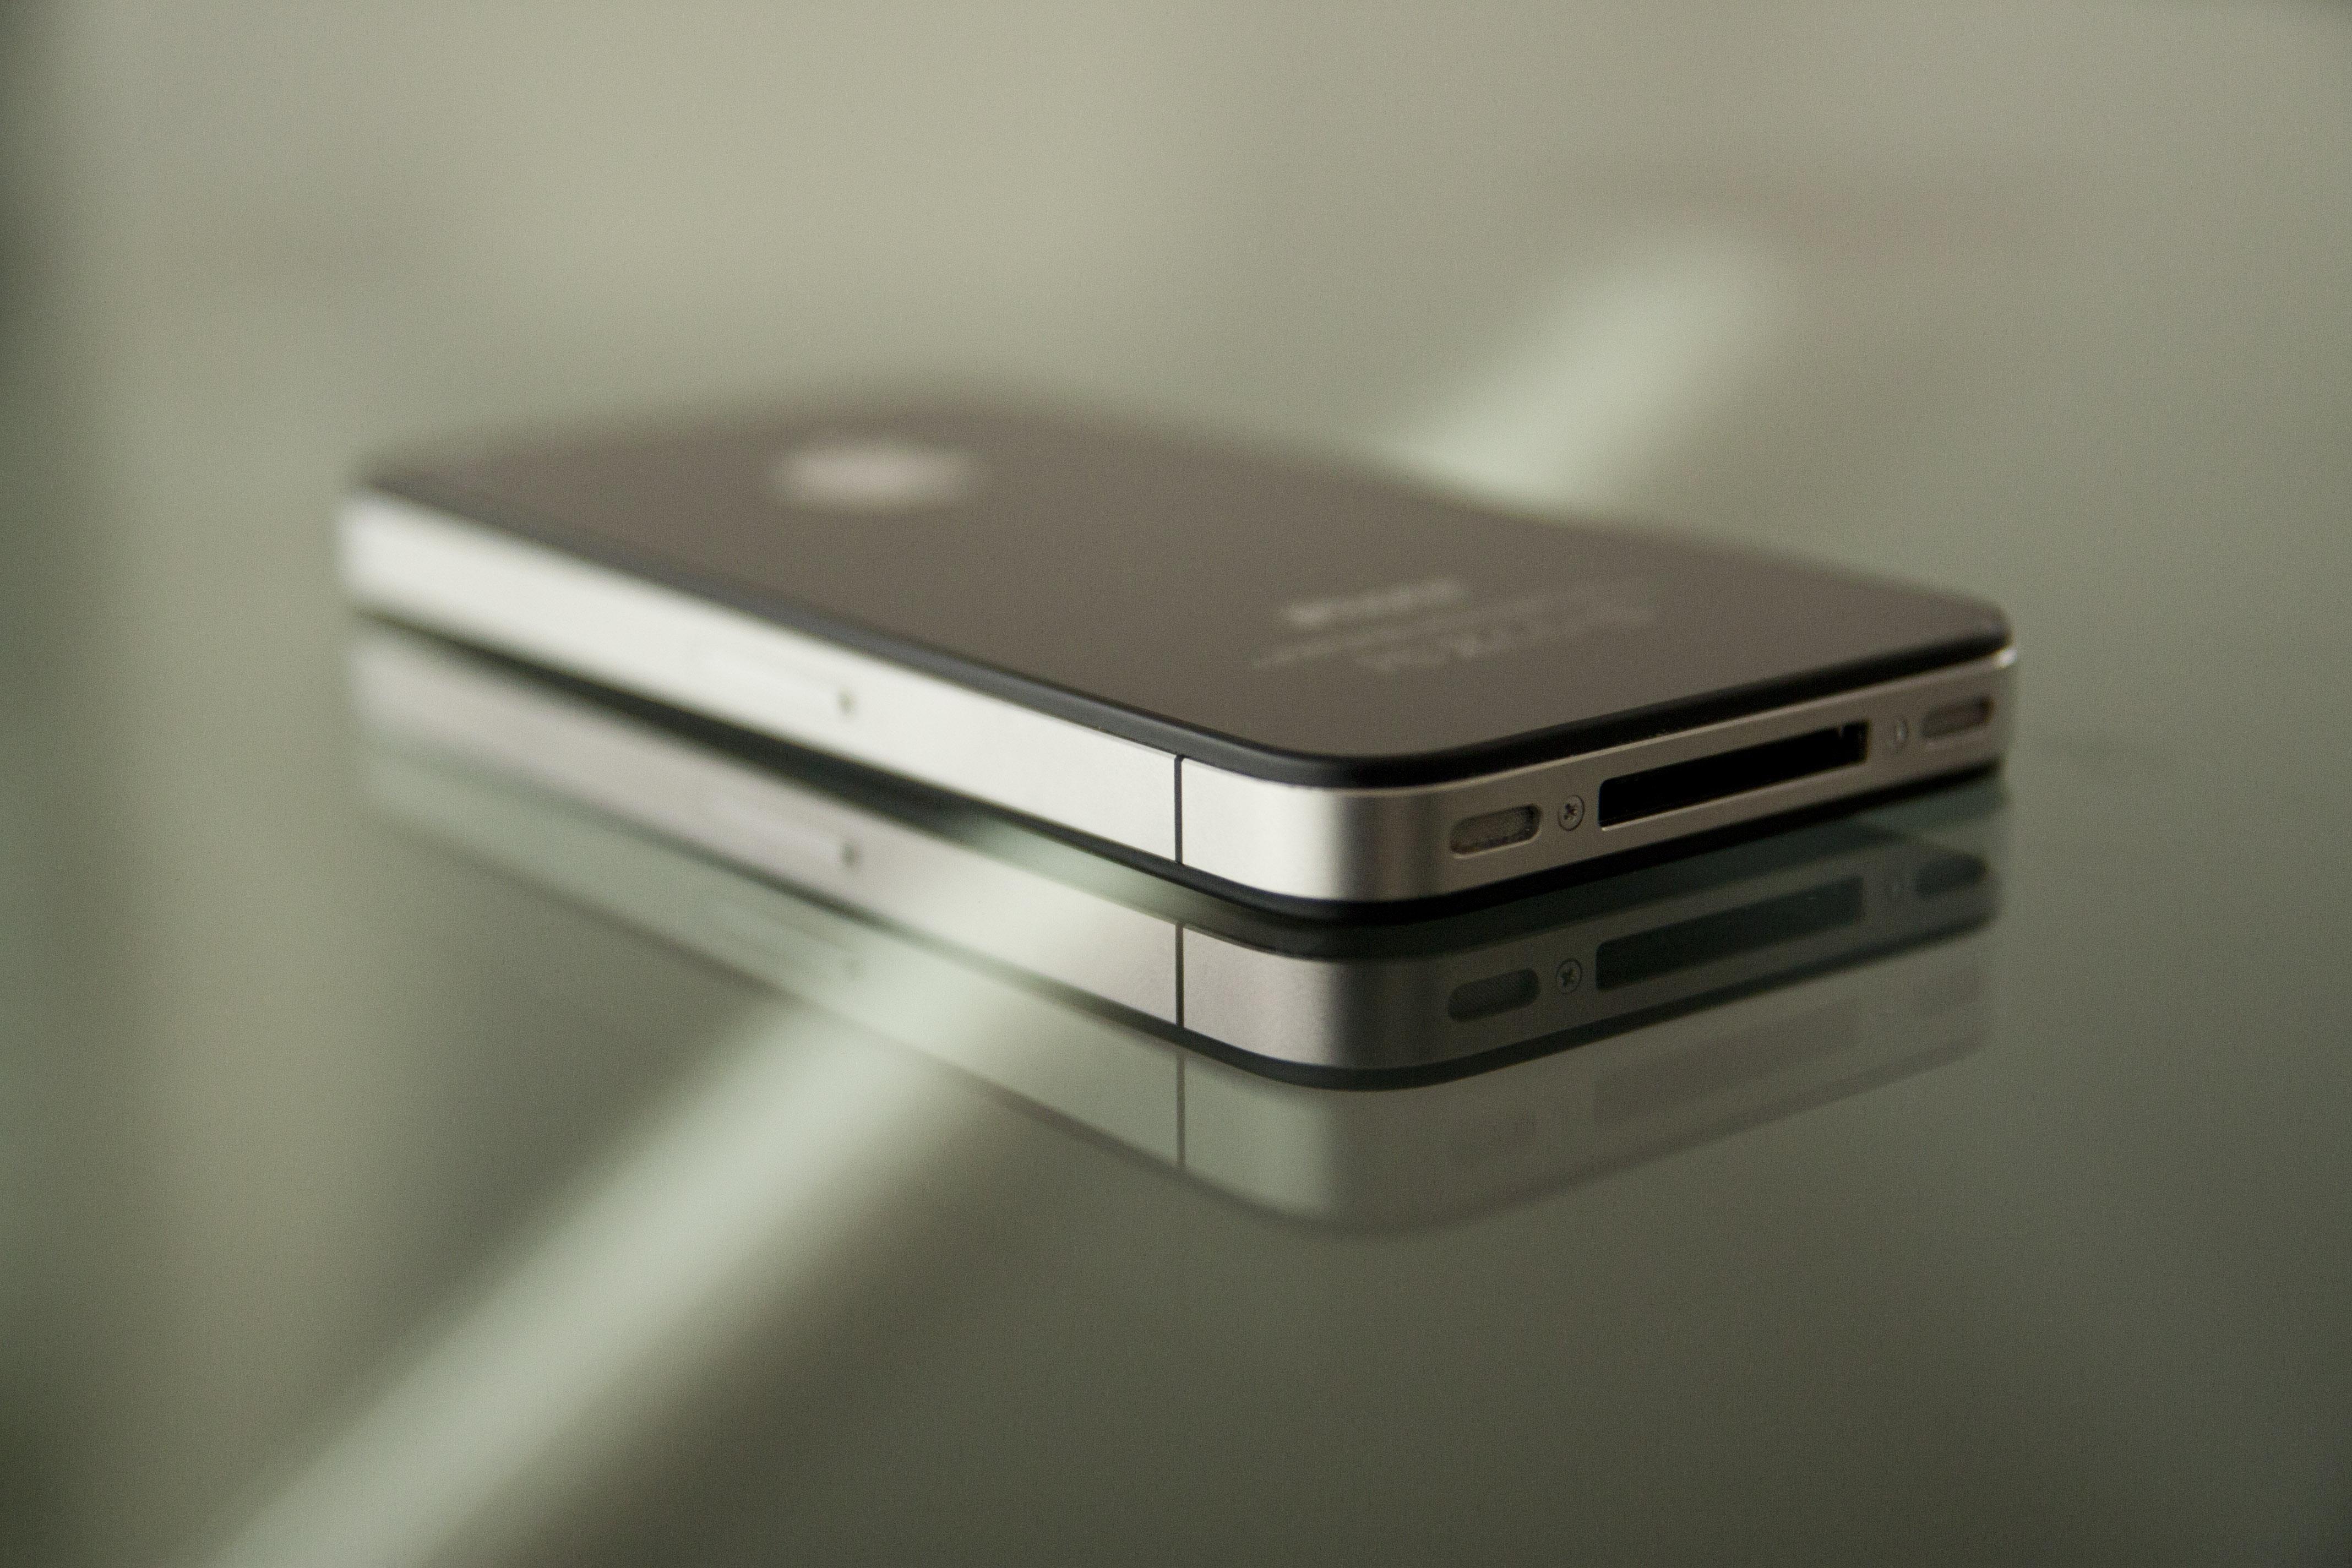 Môžem pripojiť myš k môjmu iPad mini